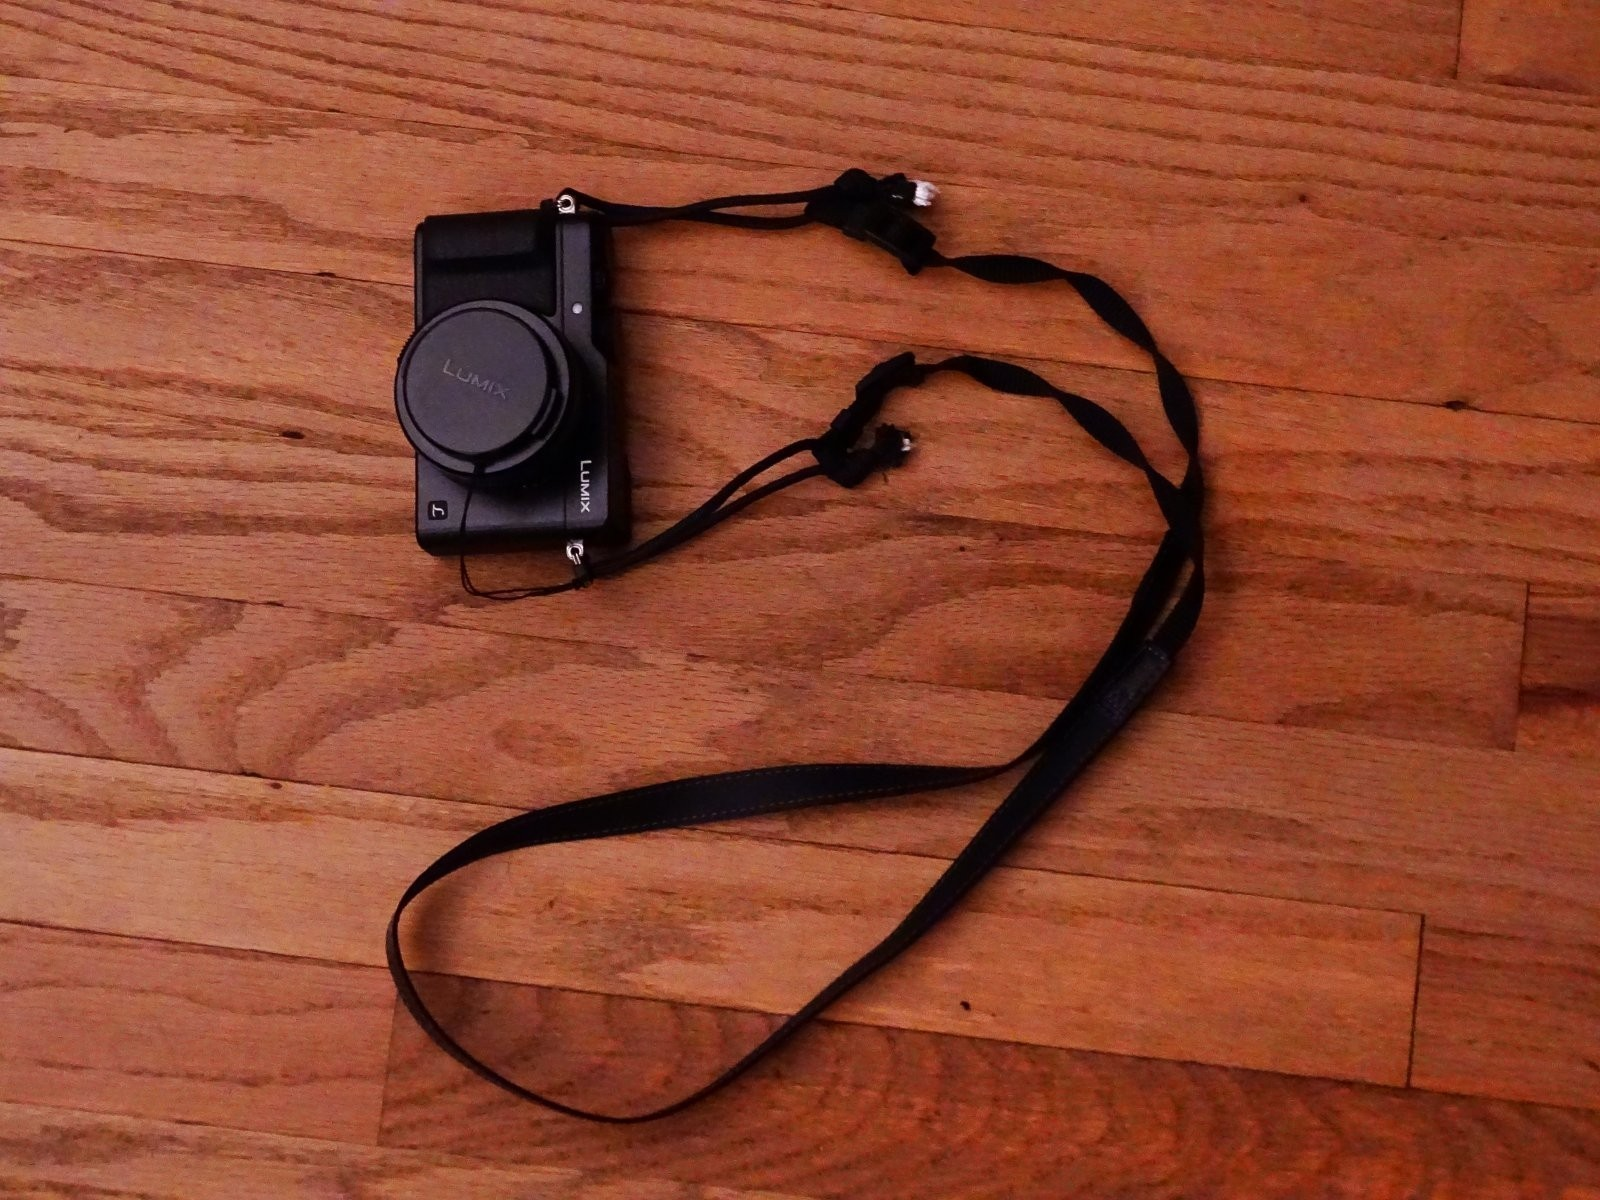 HX400V parachute cord camera strap extensions (1).JPG